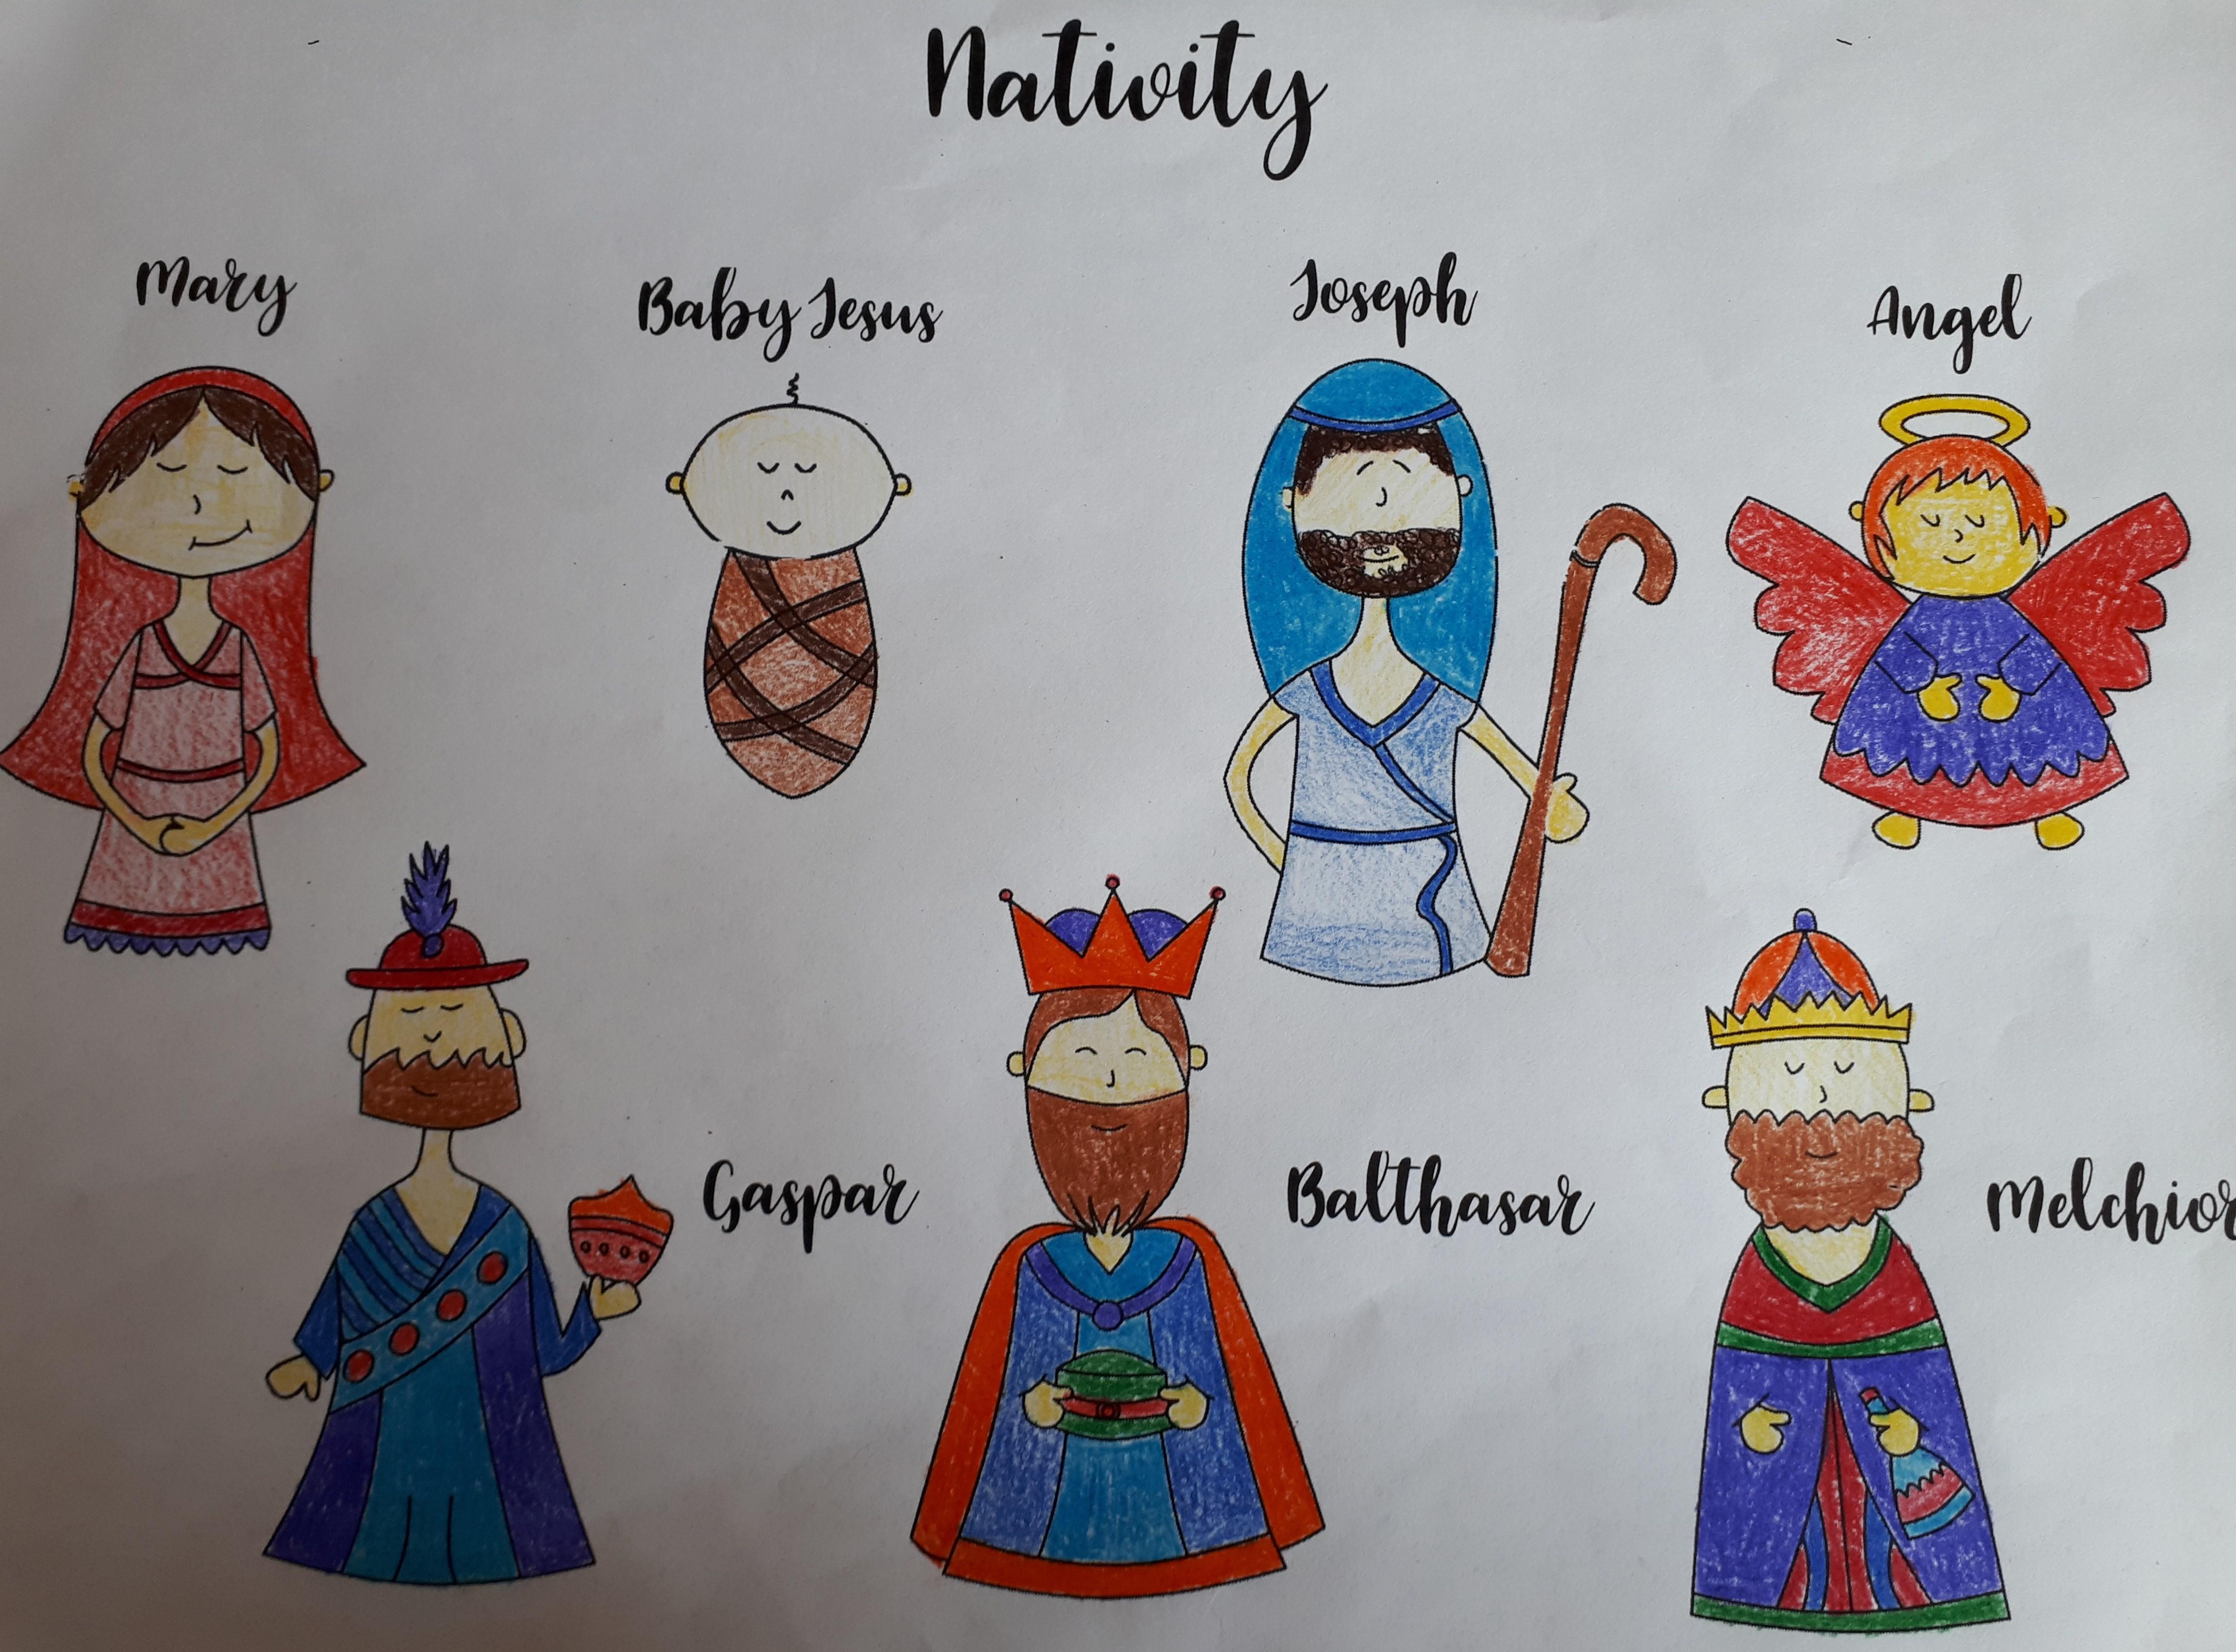 nativity-e1576286947823.jpg